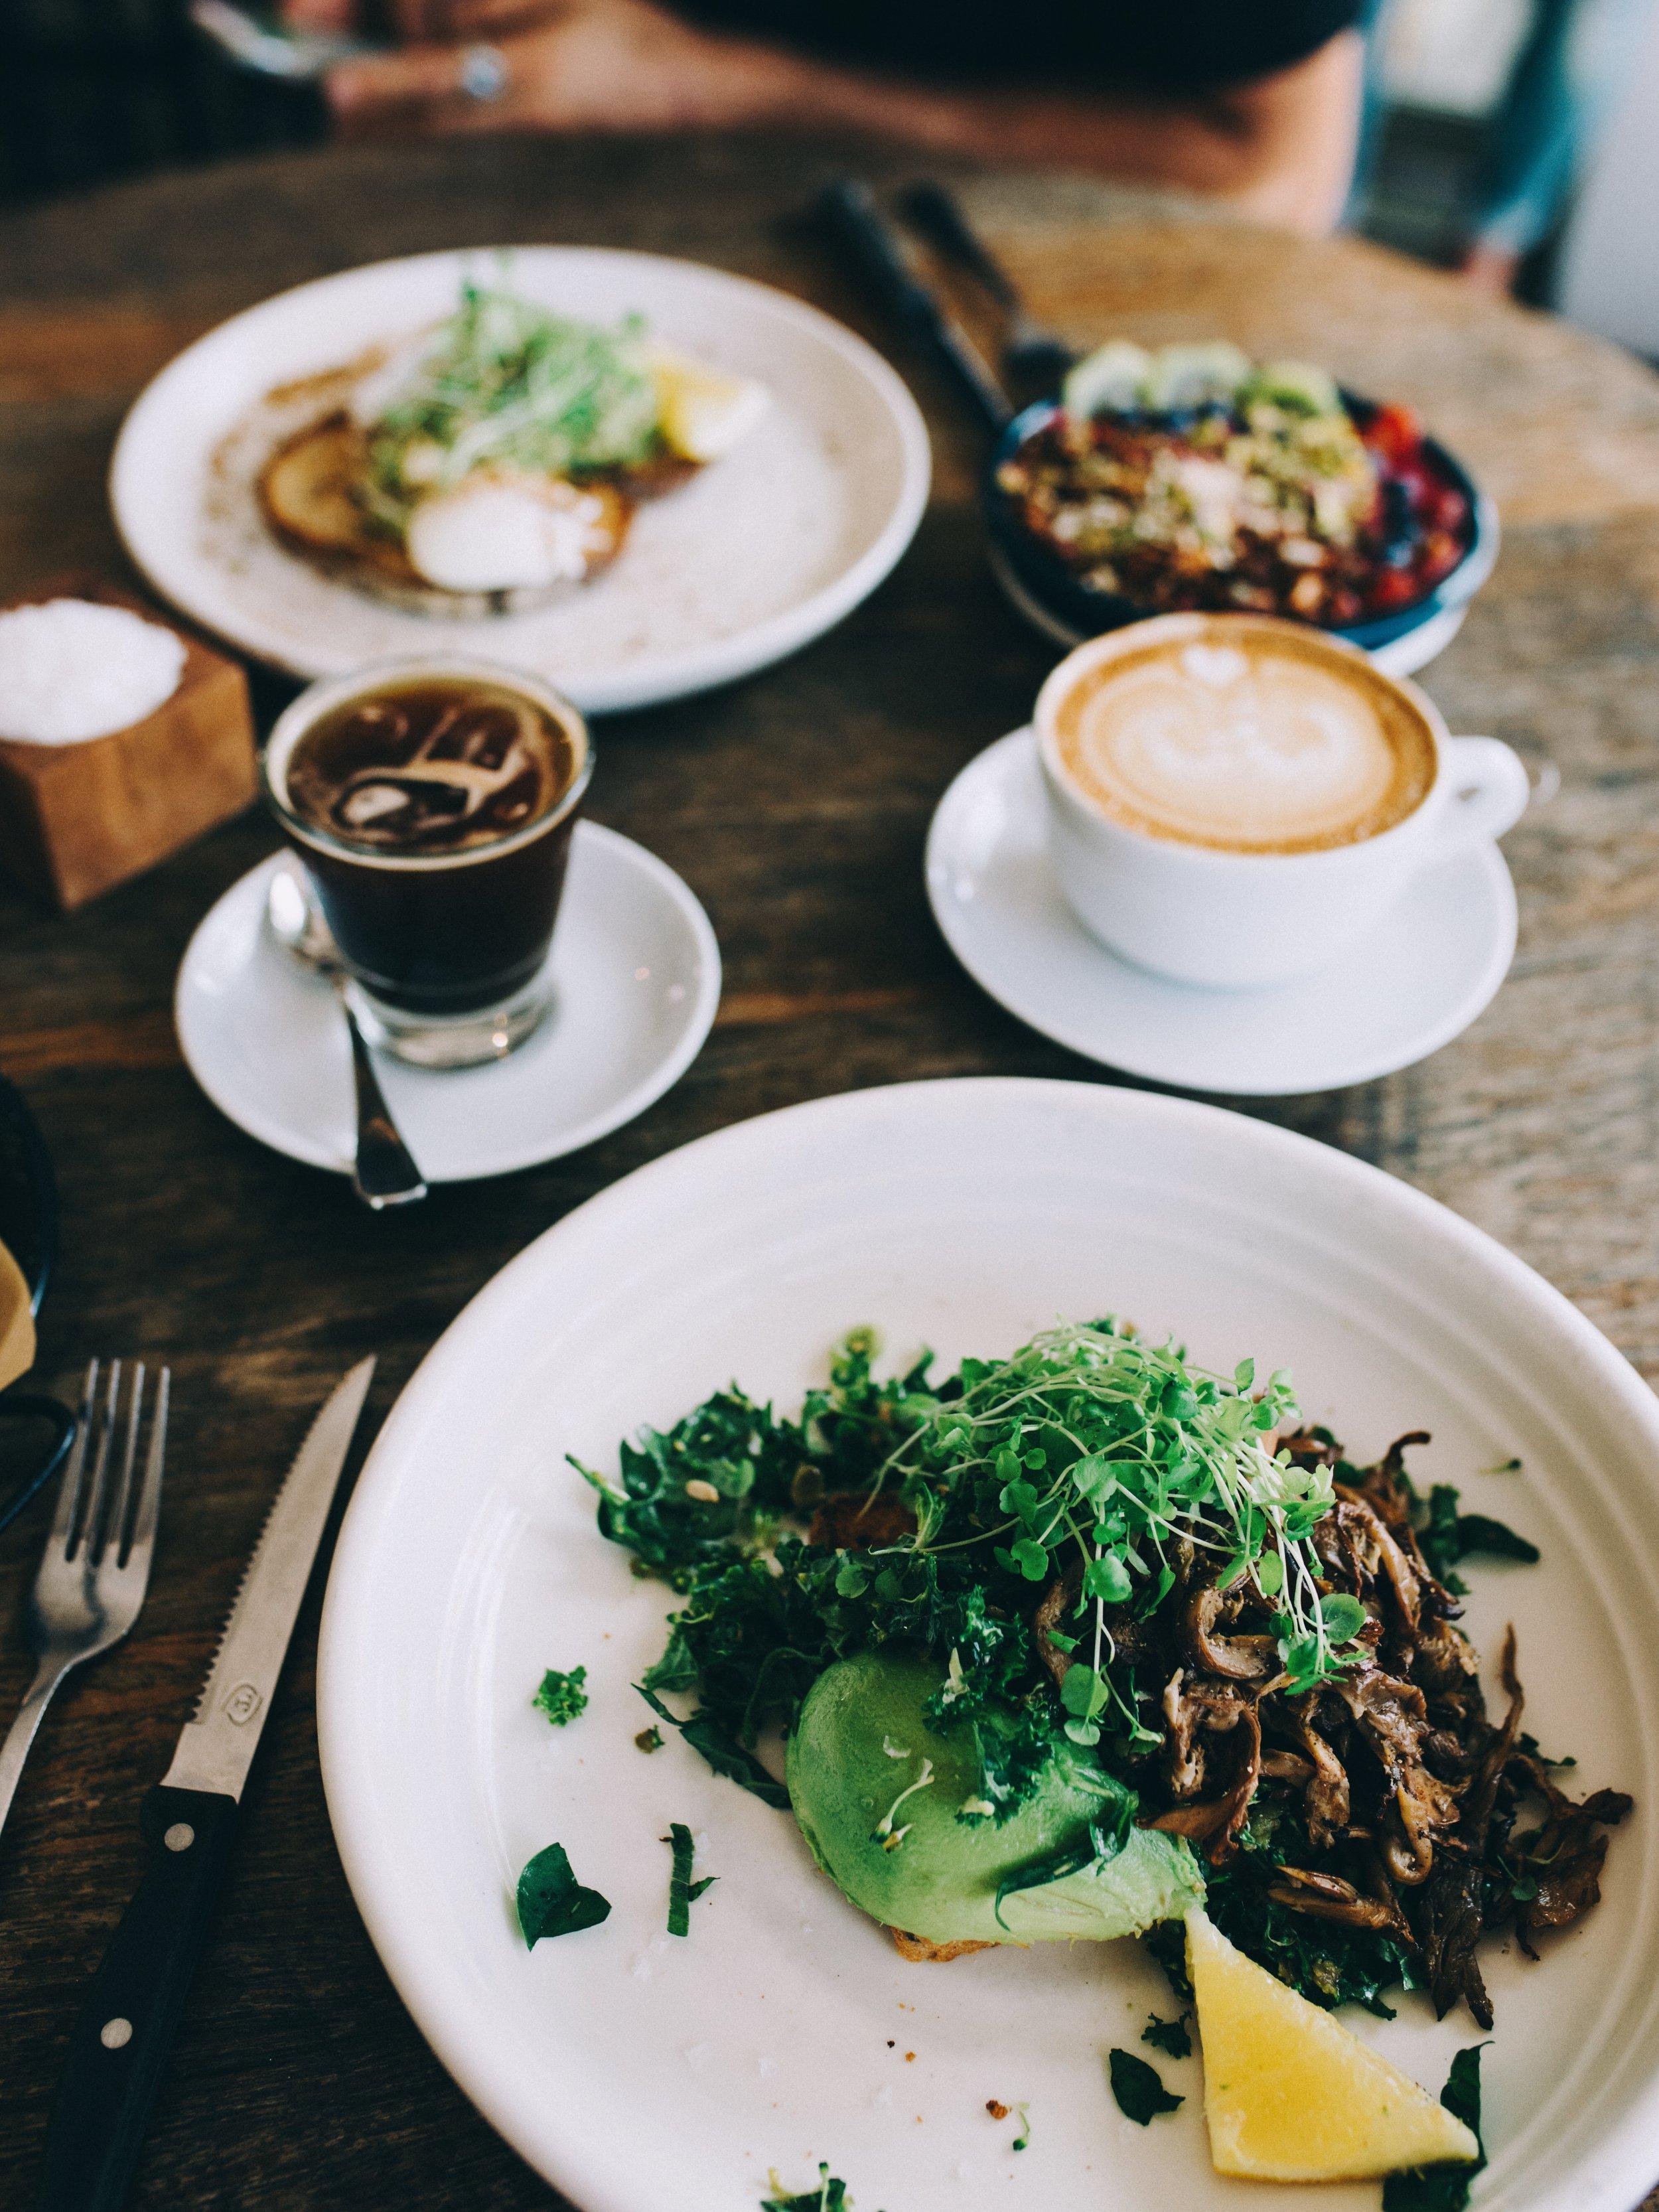 Avocado, greens, wild mushrooms on GF toast